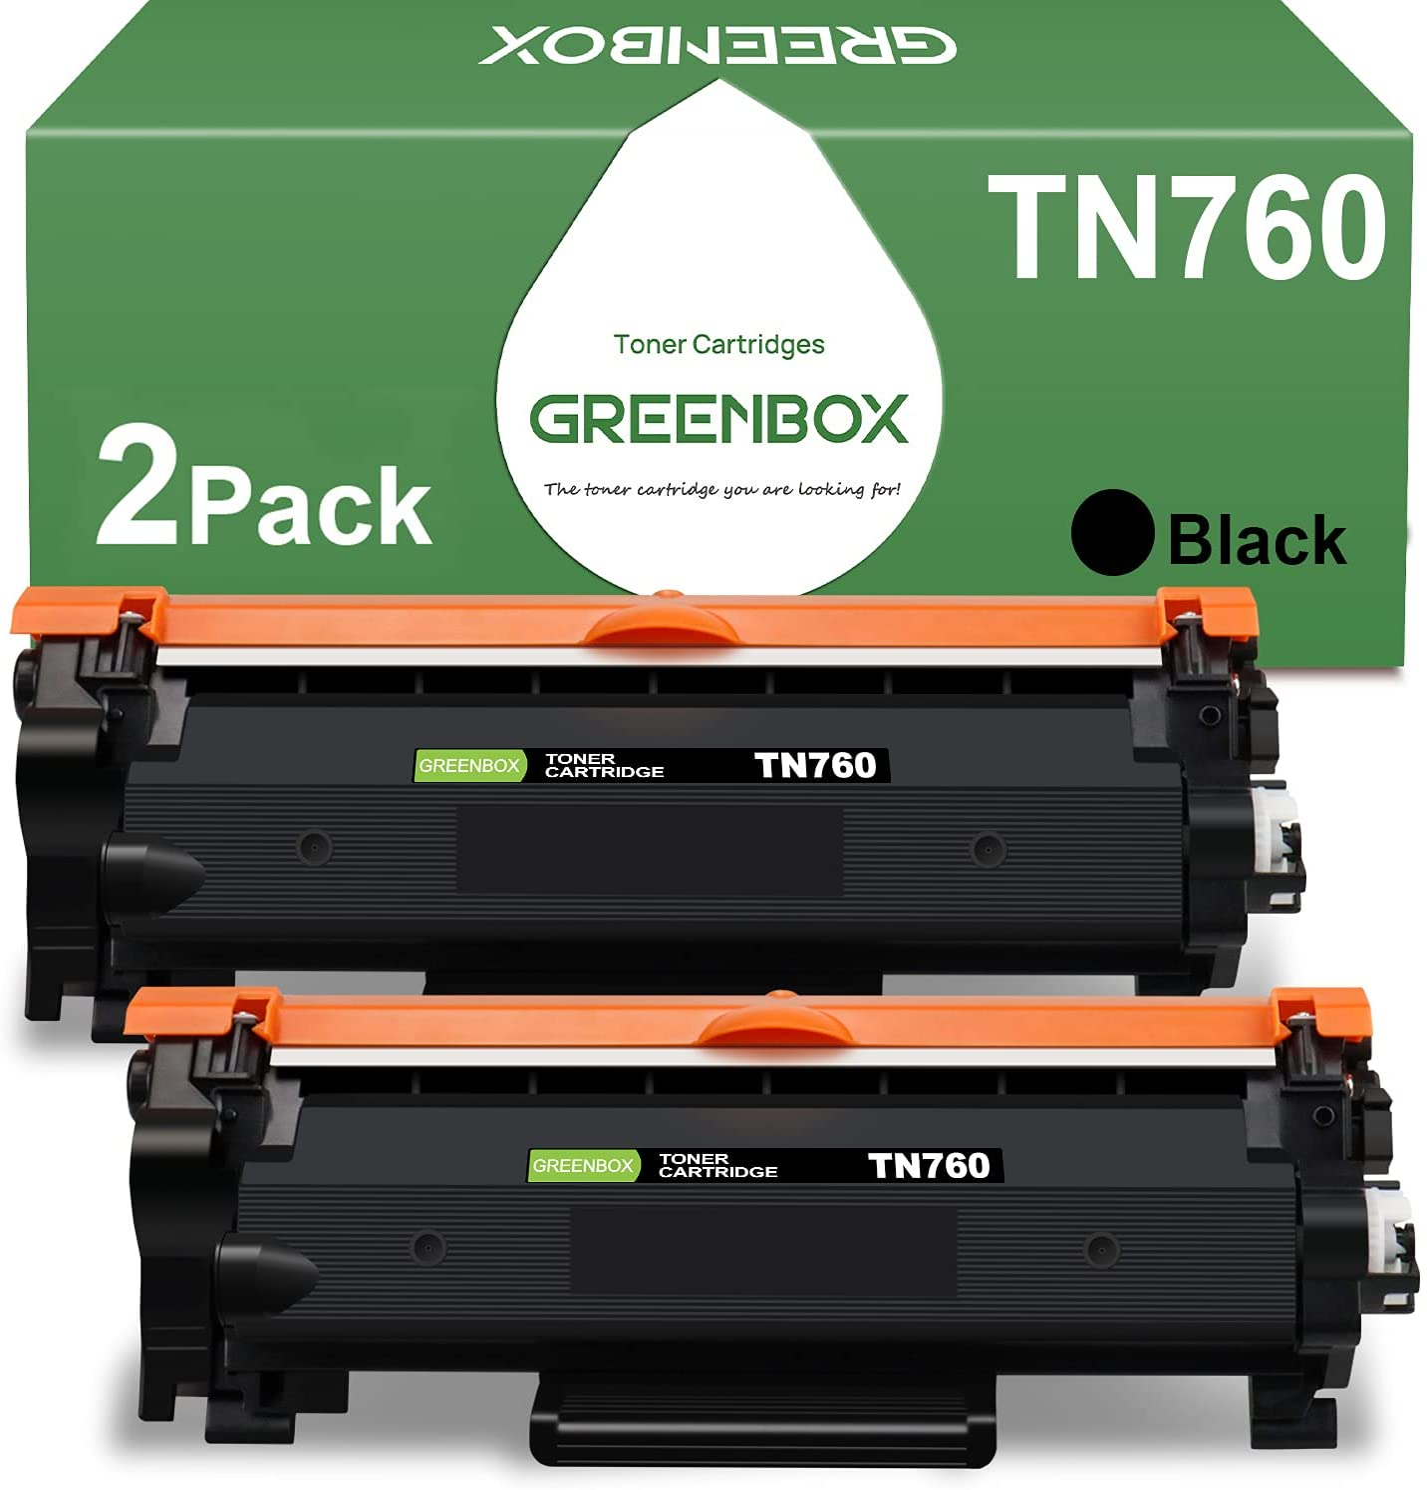 GREENBOX Compatible Toner Cartridge Replacement for Brother TN760 TN-760 TN730 TN-730 for HL-L2350DW DCP-L2550DW HL-L2395DW HL-L2390DW HL-L2370DW Printer (2 Black)